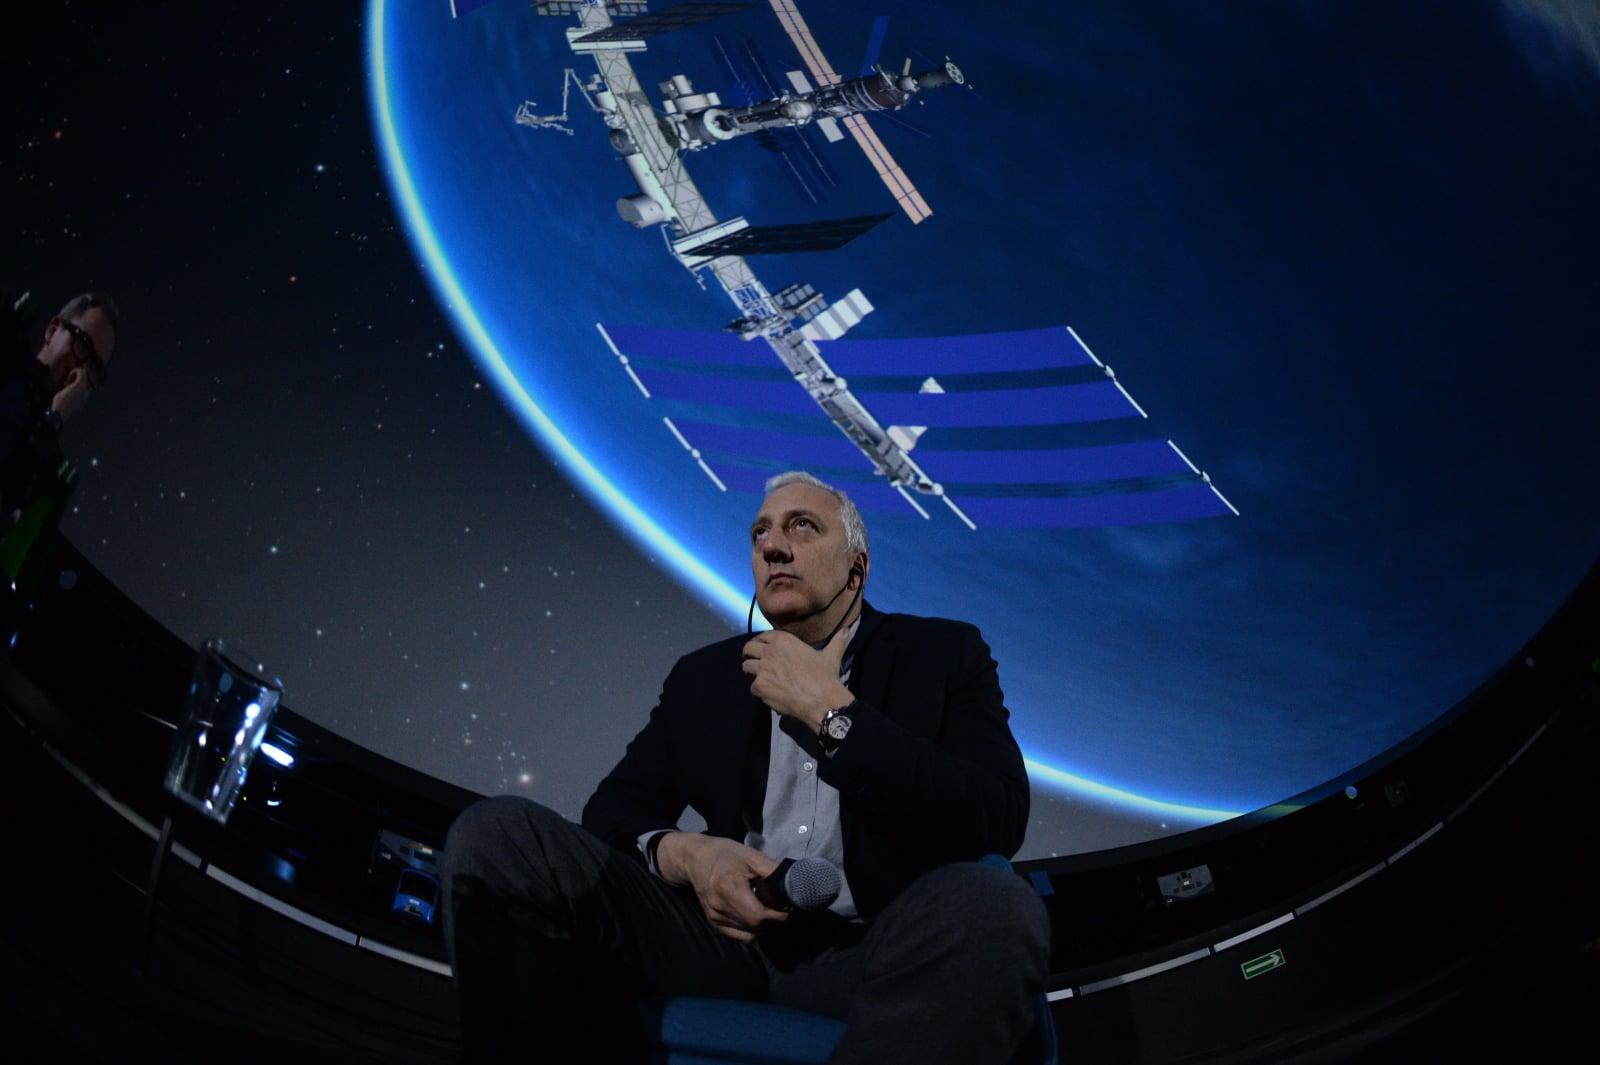 Astronauta NASA Michael (Mike) Massimino PAP/Jacek Turczyk